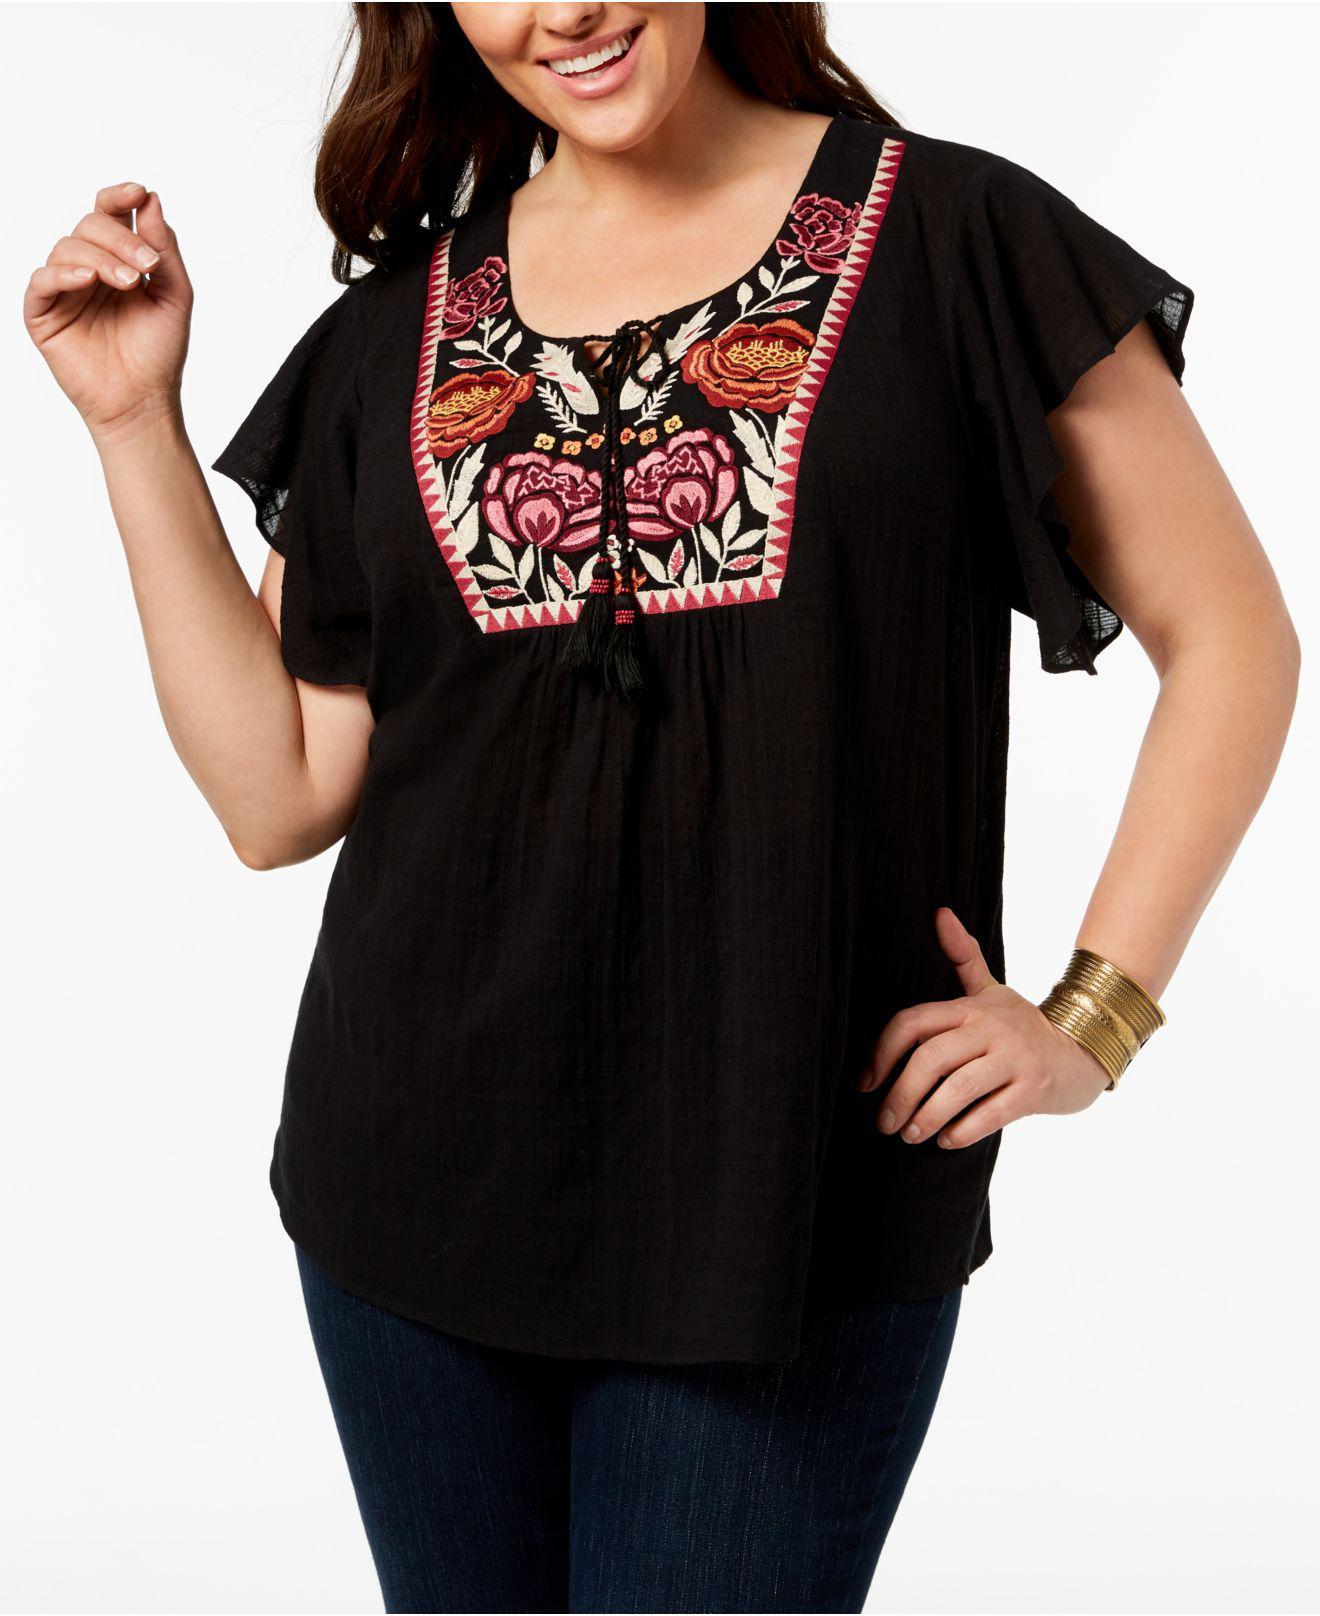 0e40dd118728e3 Lyst - Style & Co. Plus Size Cotton Gauze Embroidered Peasant Top ...